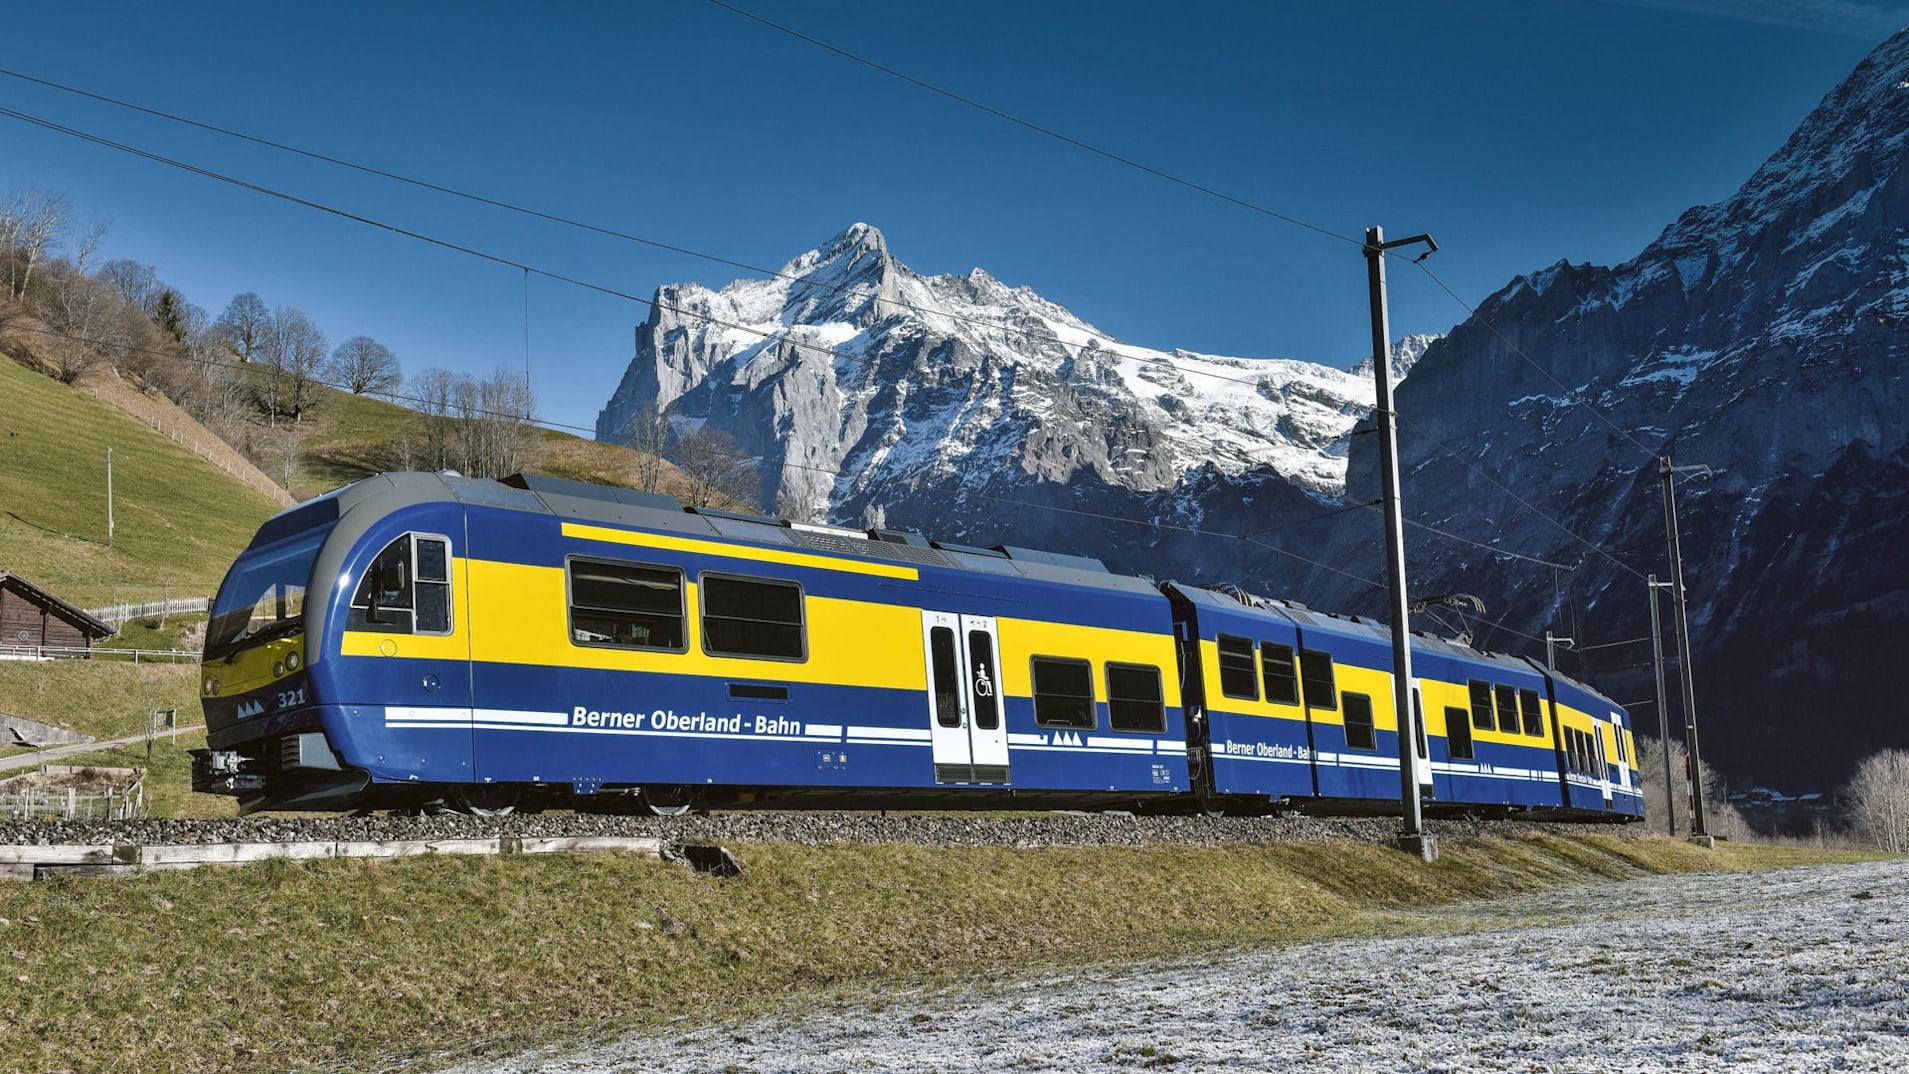 Berner oberlandbahn wetterhorn sommer